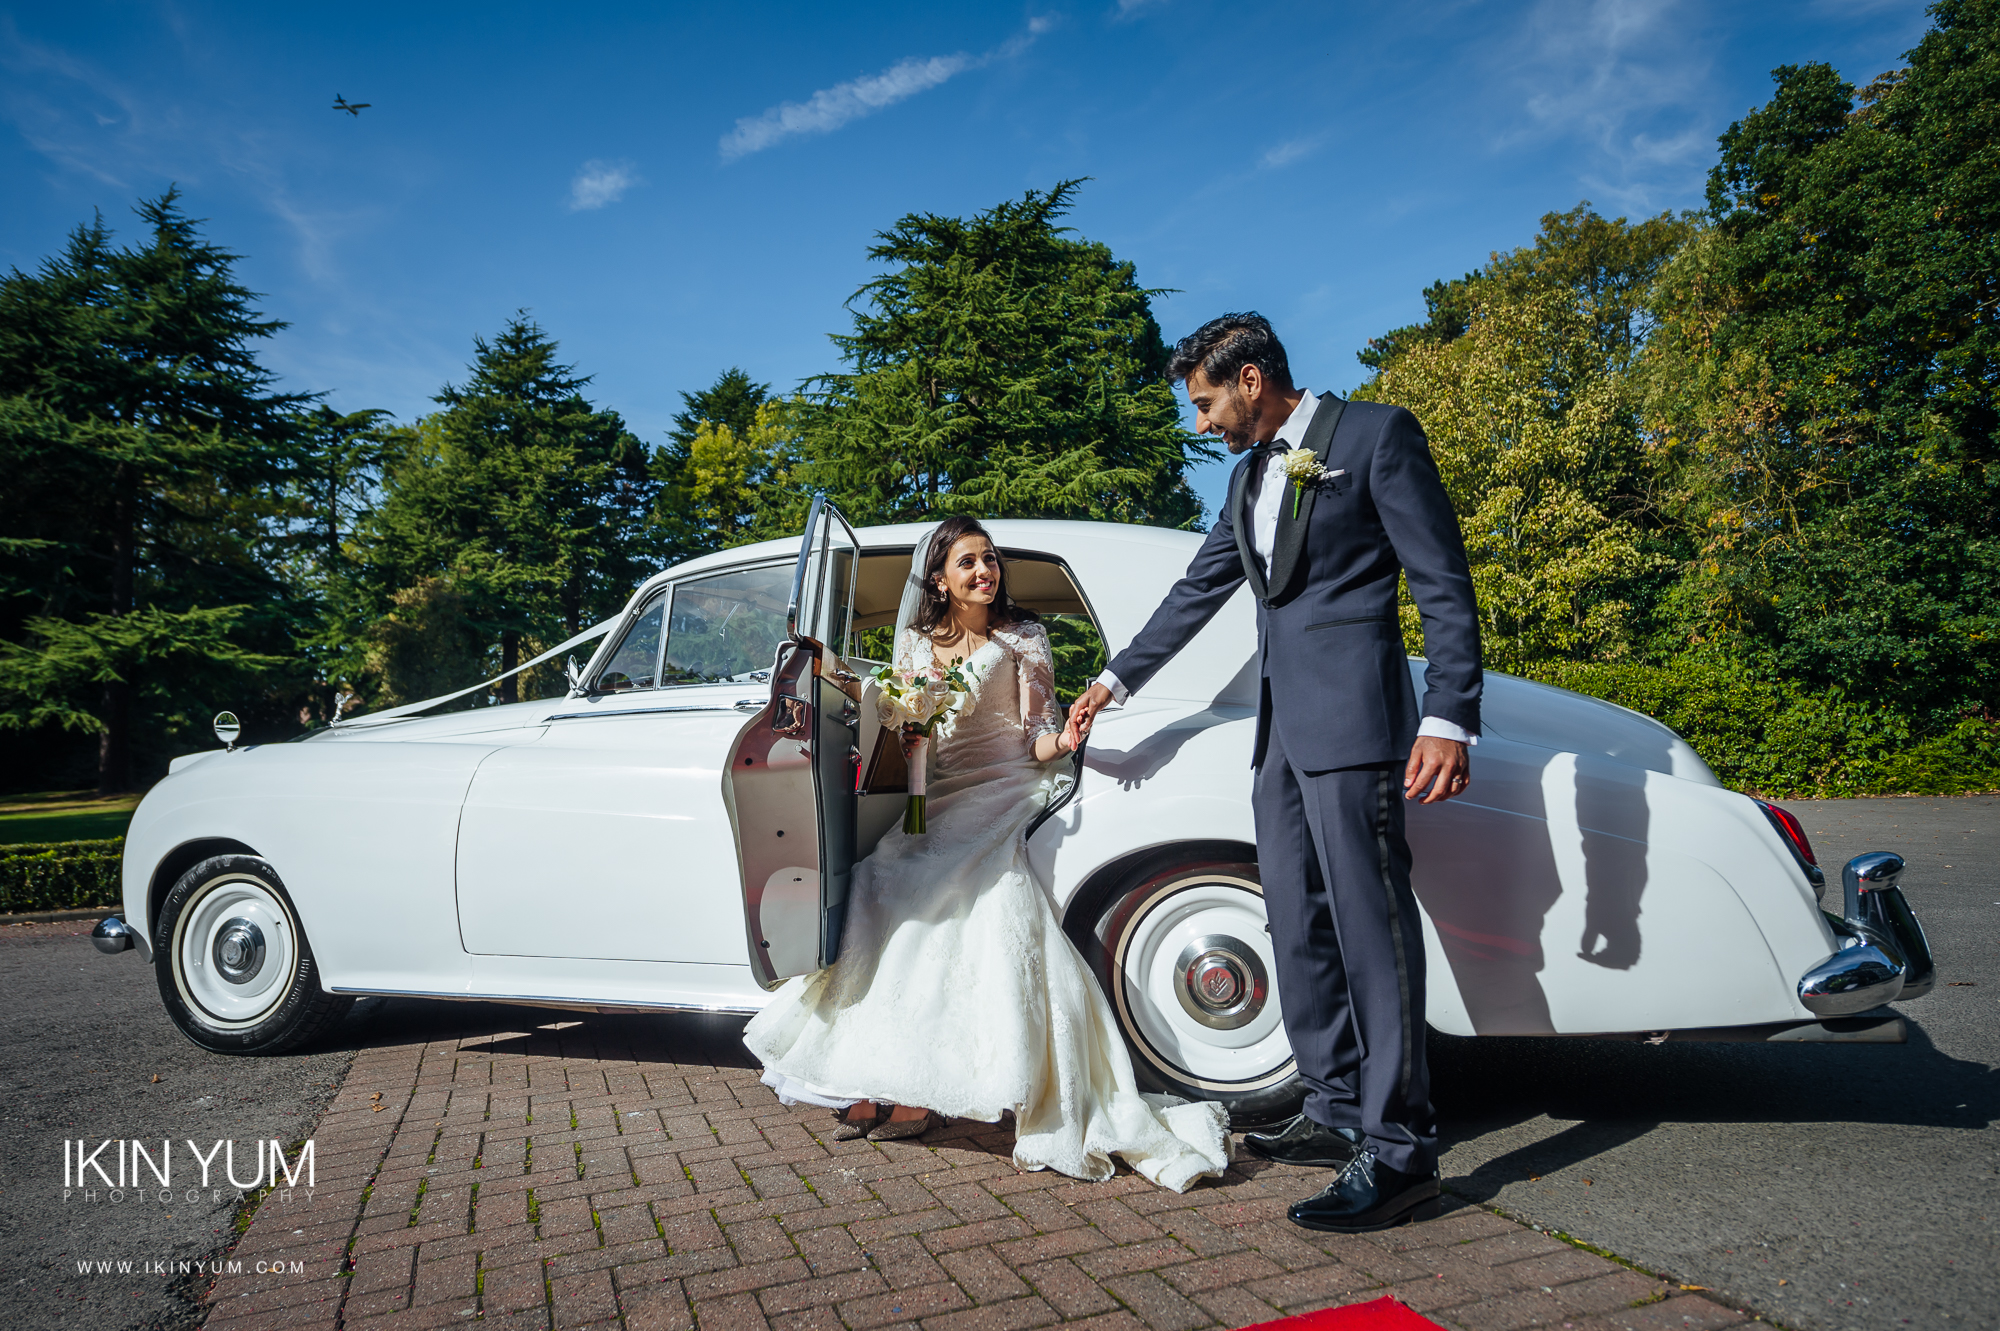 Laura Ashley Manor Wedding - Ikin Yum Photography-085.jpg